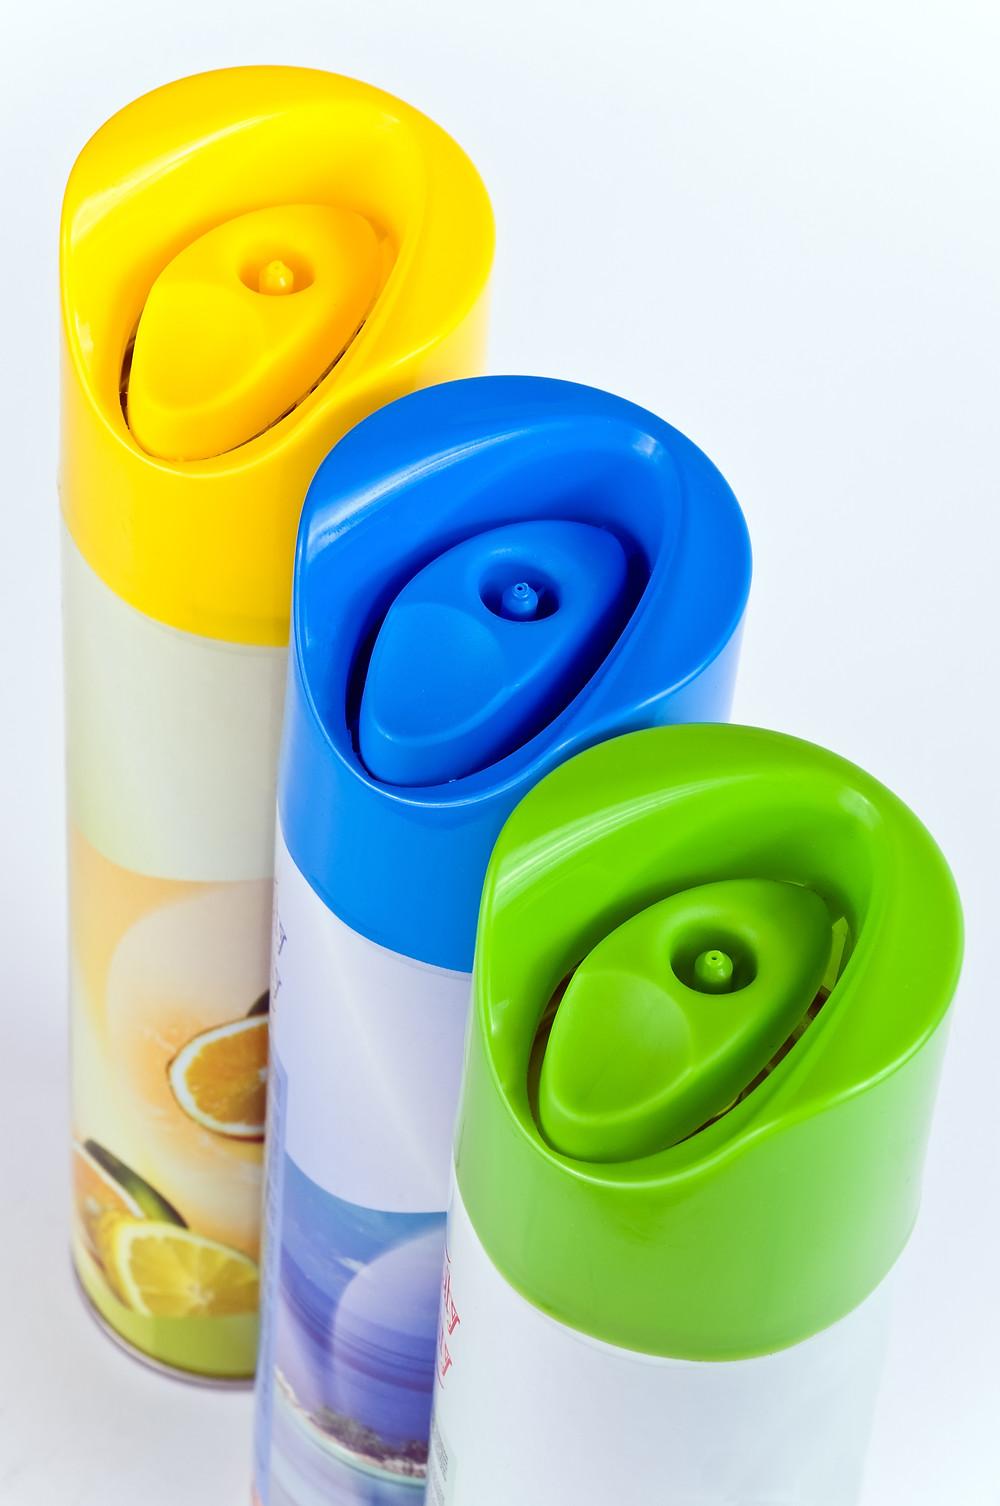 Air Freshener questions